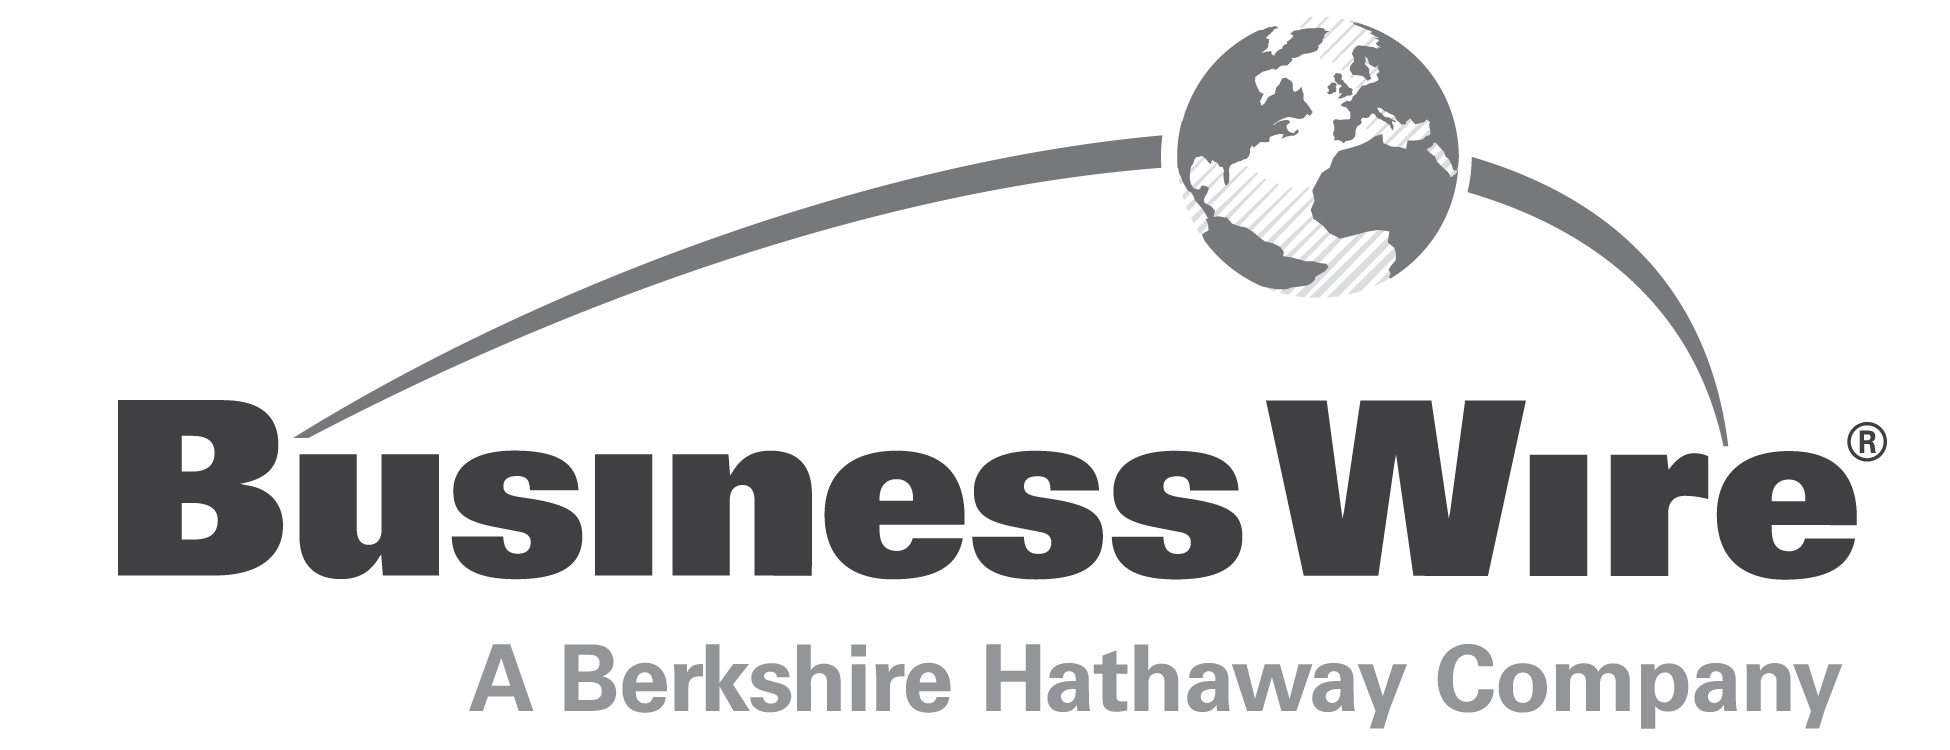 BW_gray_logo.jpg